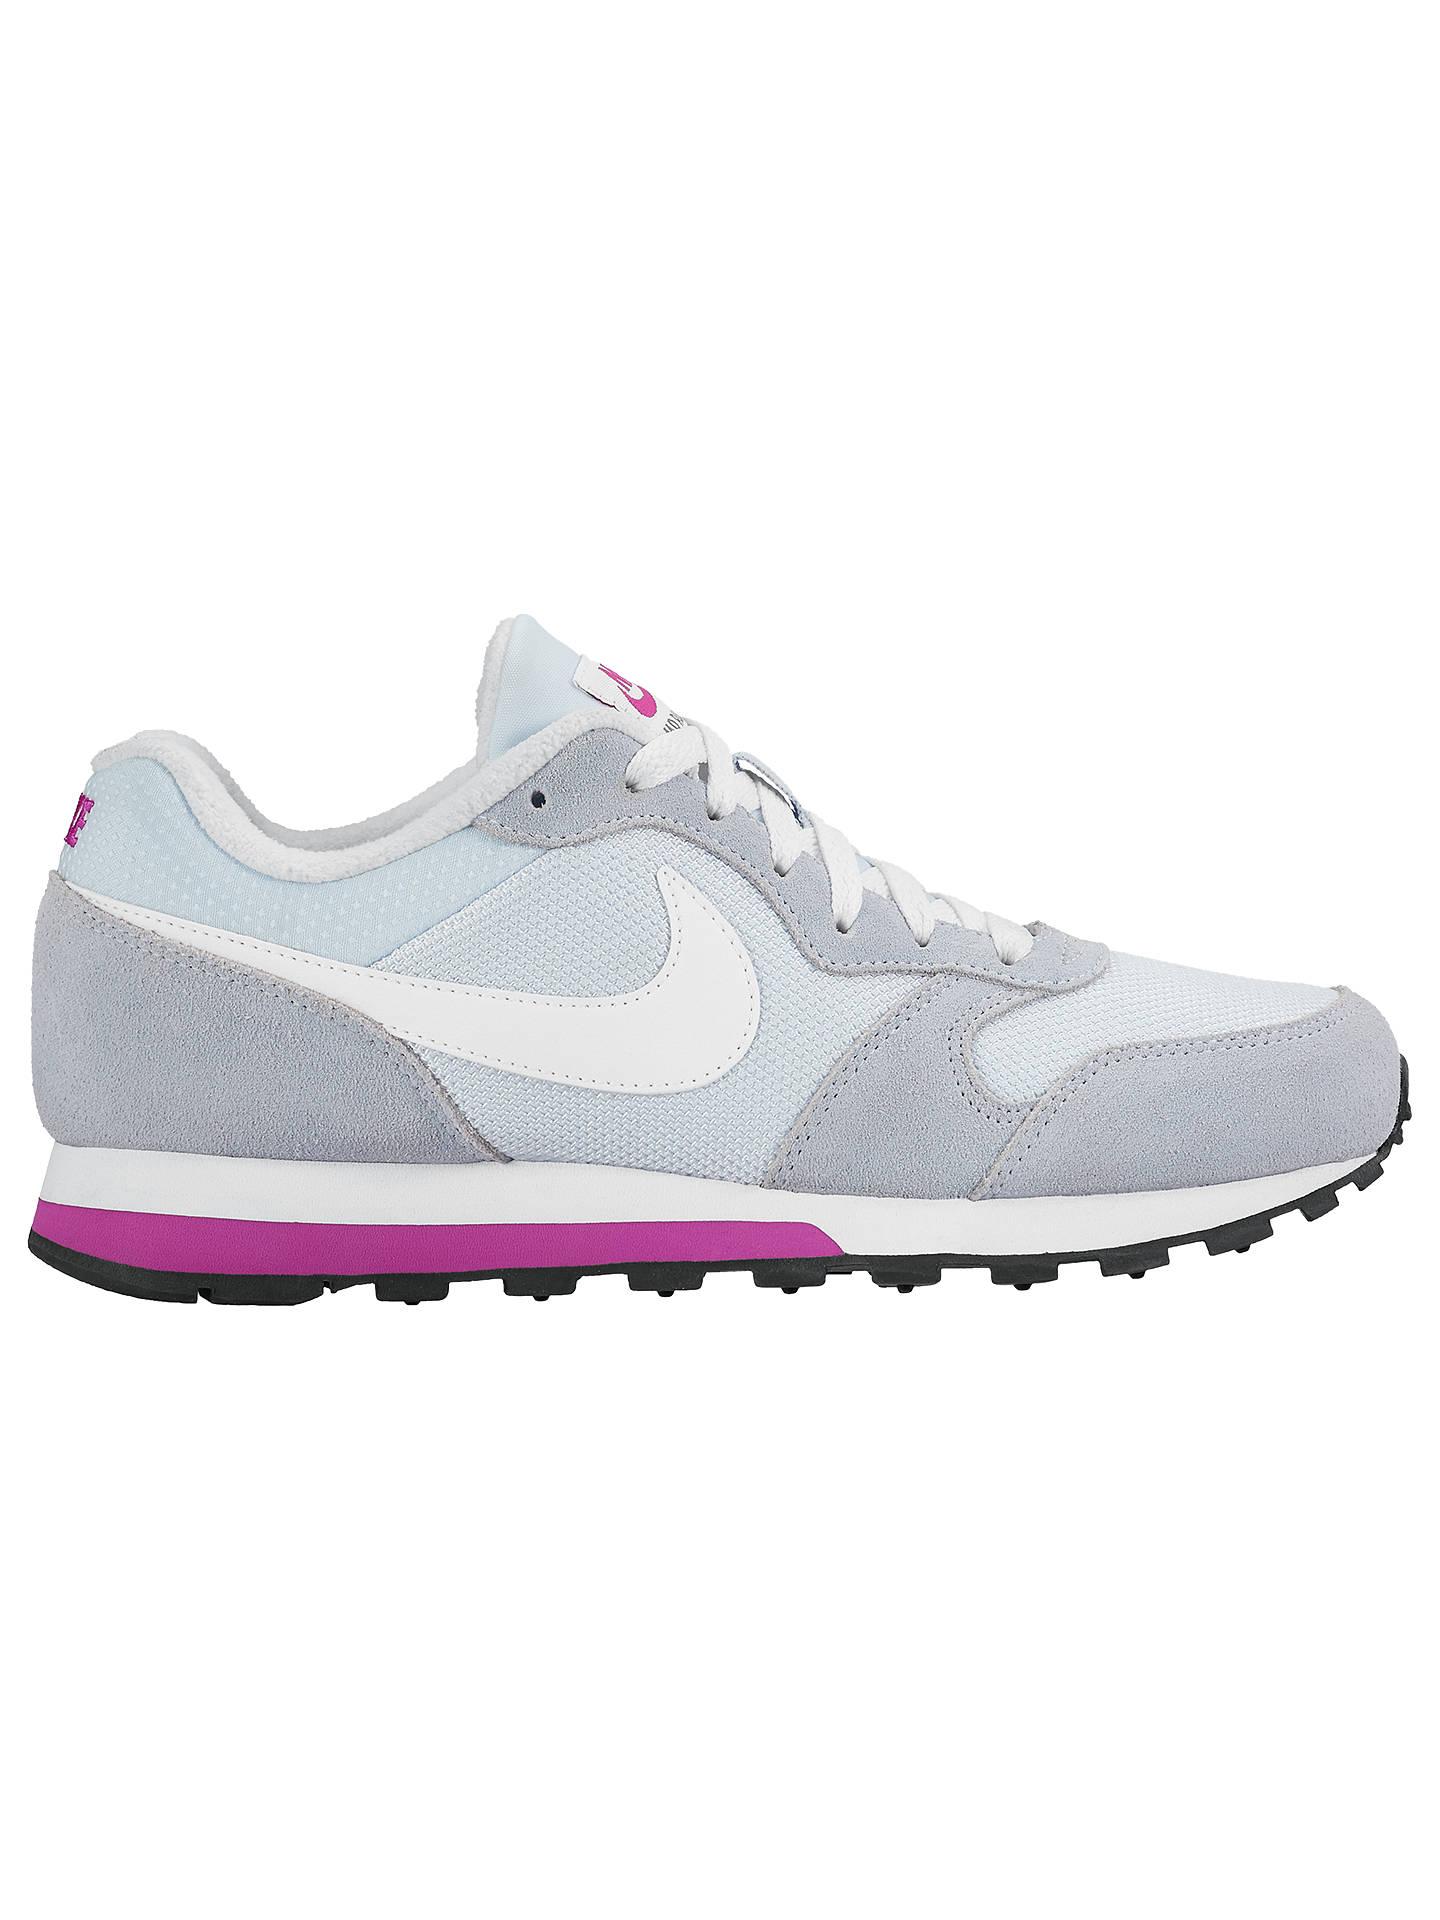 b2f9bd11f66fb3 Buy Nike MD Runner 2 Women s Trainers